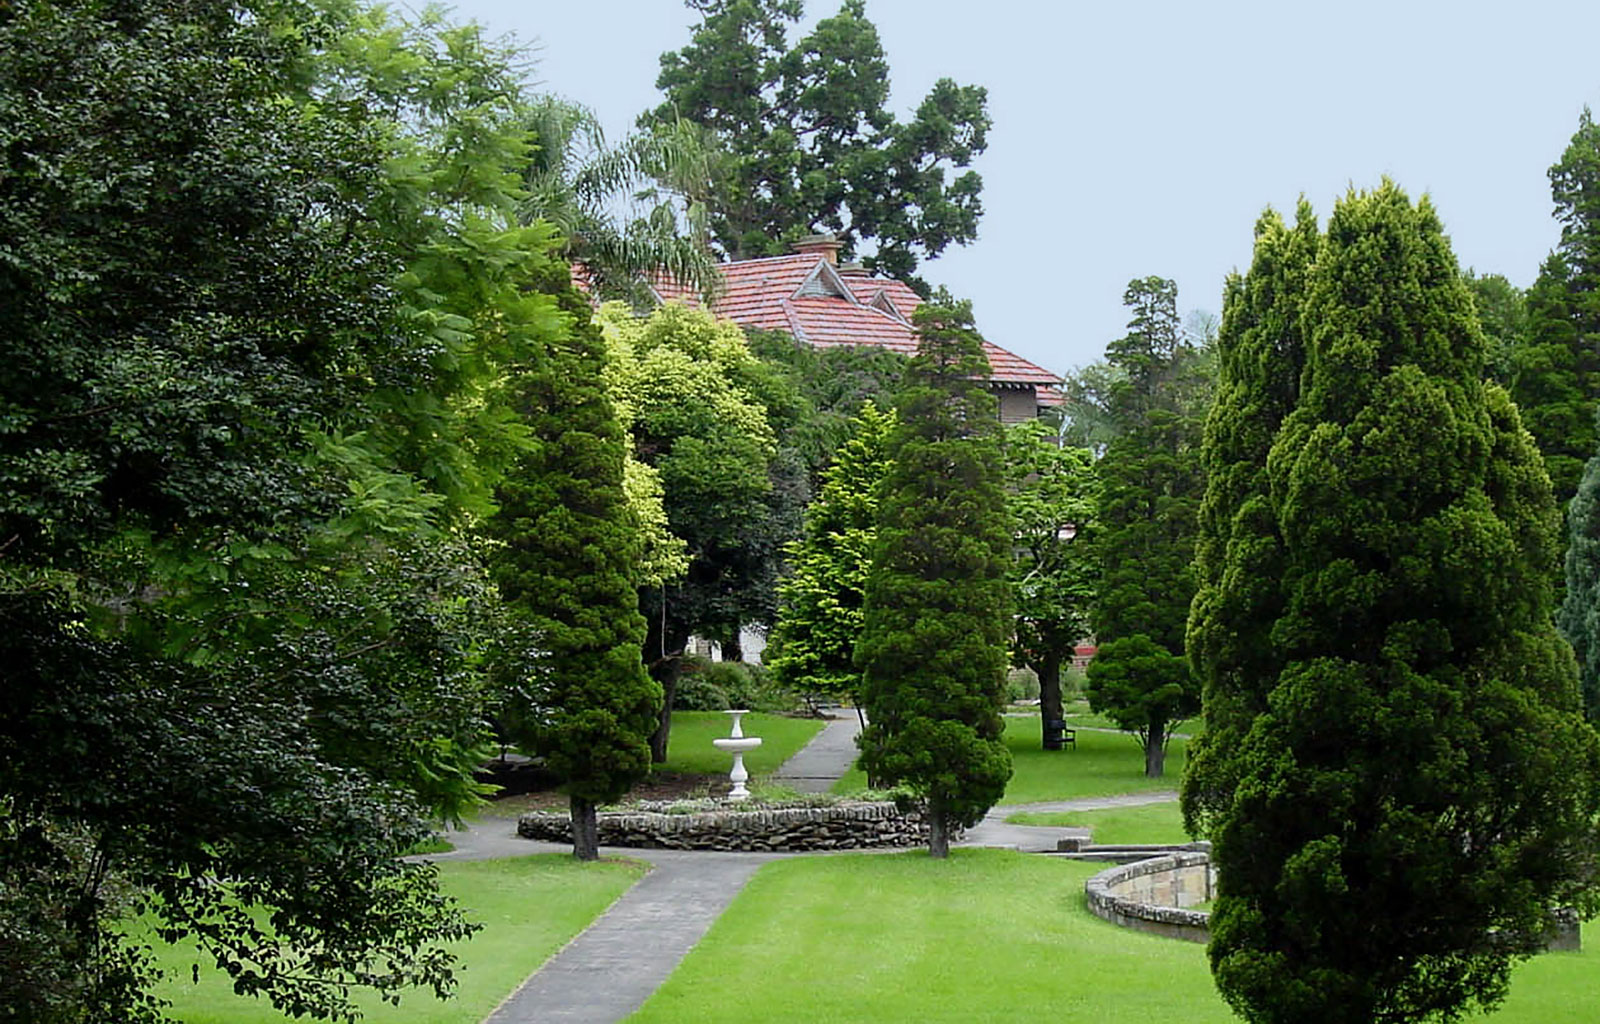 Online public meeting to Save Callan Park